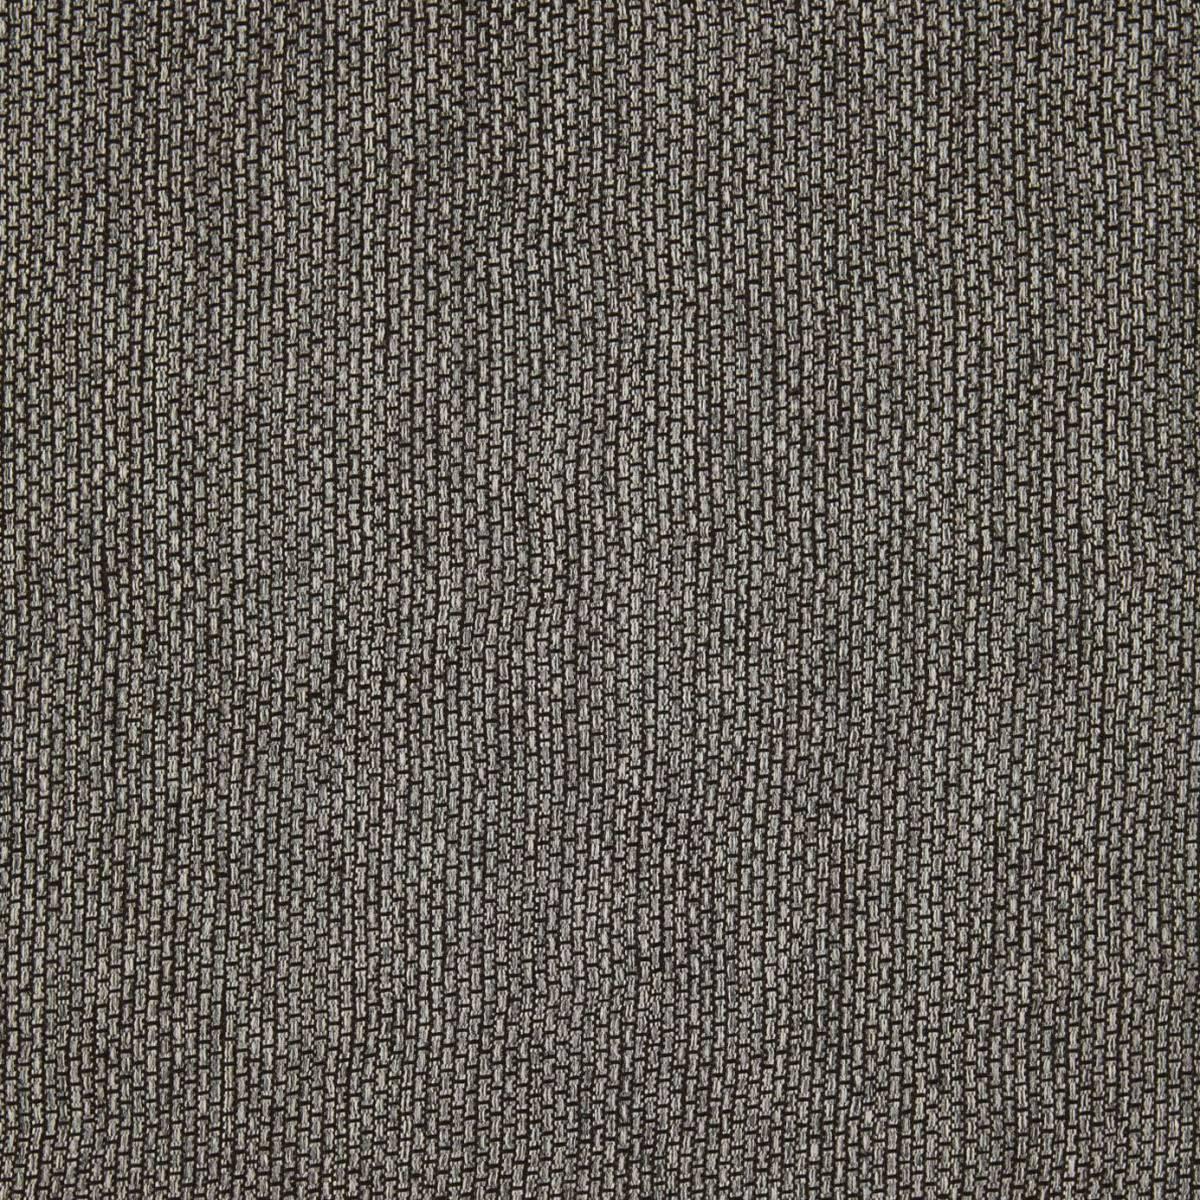 Jute Fabric Charcoal Silver 131806 Anthology